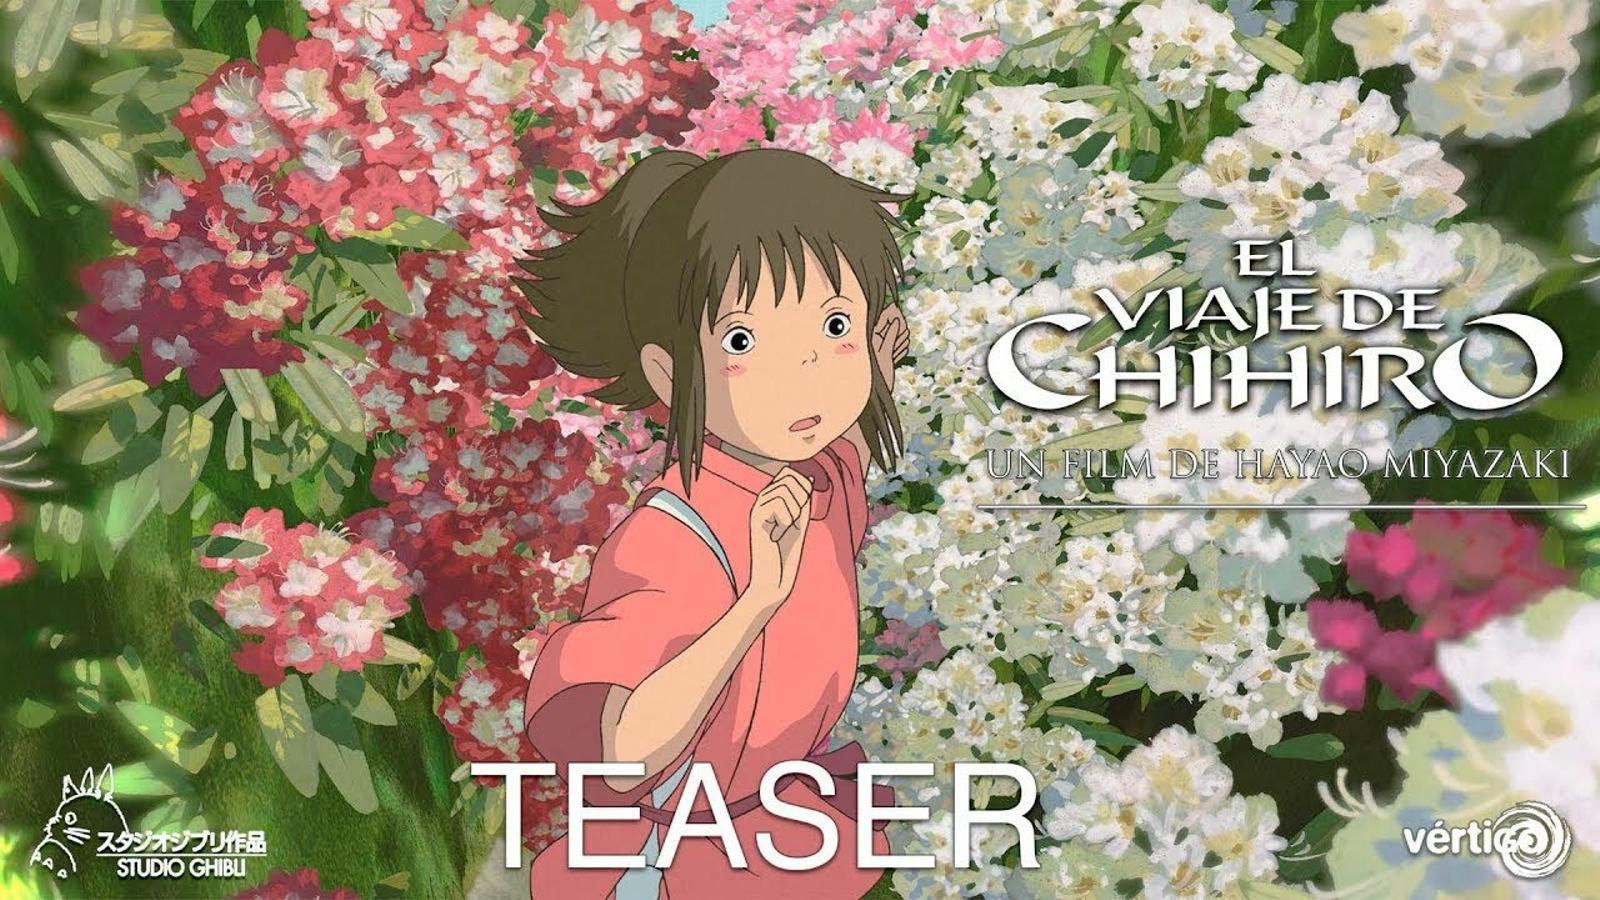 Tràiler d''El viatge de Chihiro', de Hayao Miyazaki